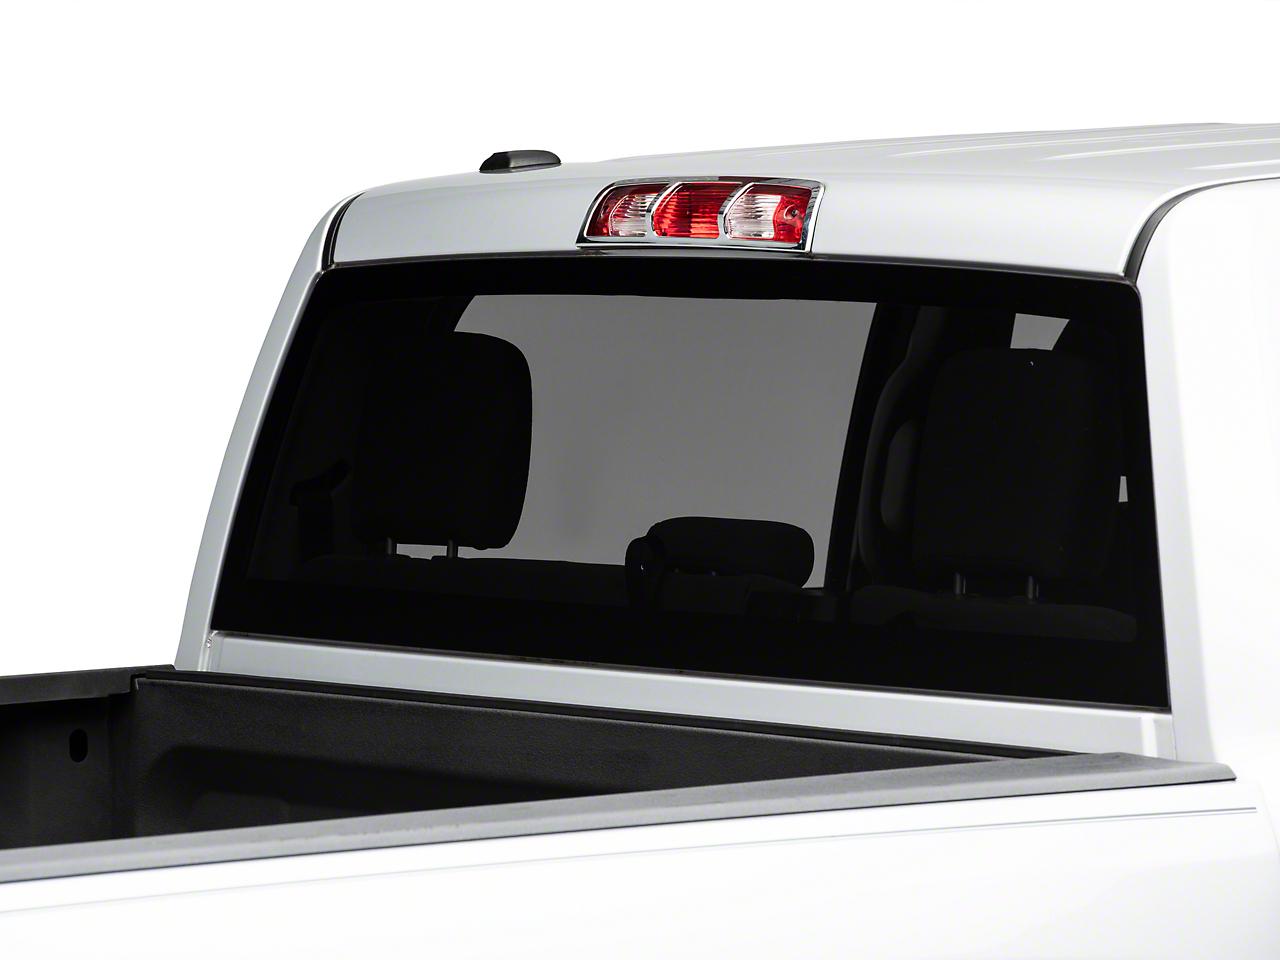 ABS Third Brake Light Cover - Chrome (09-18 RAM 1500)